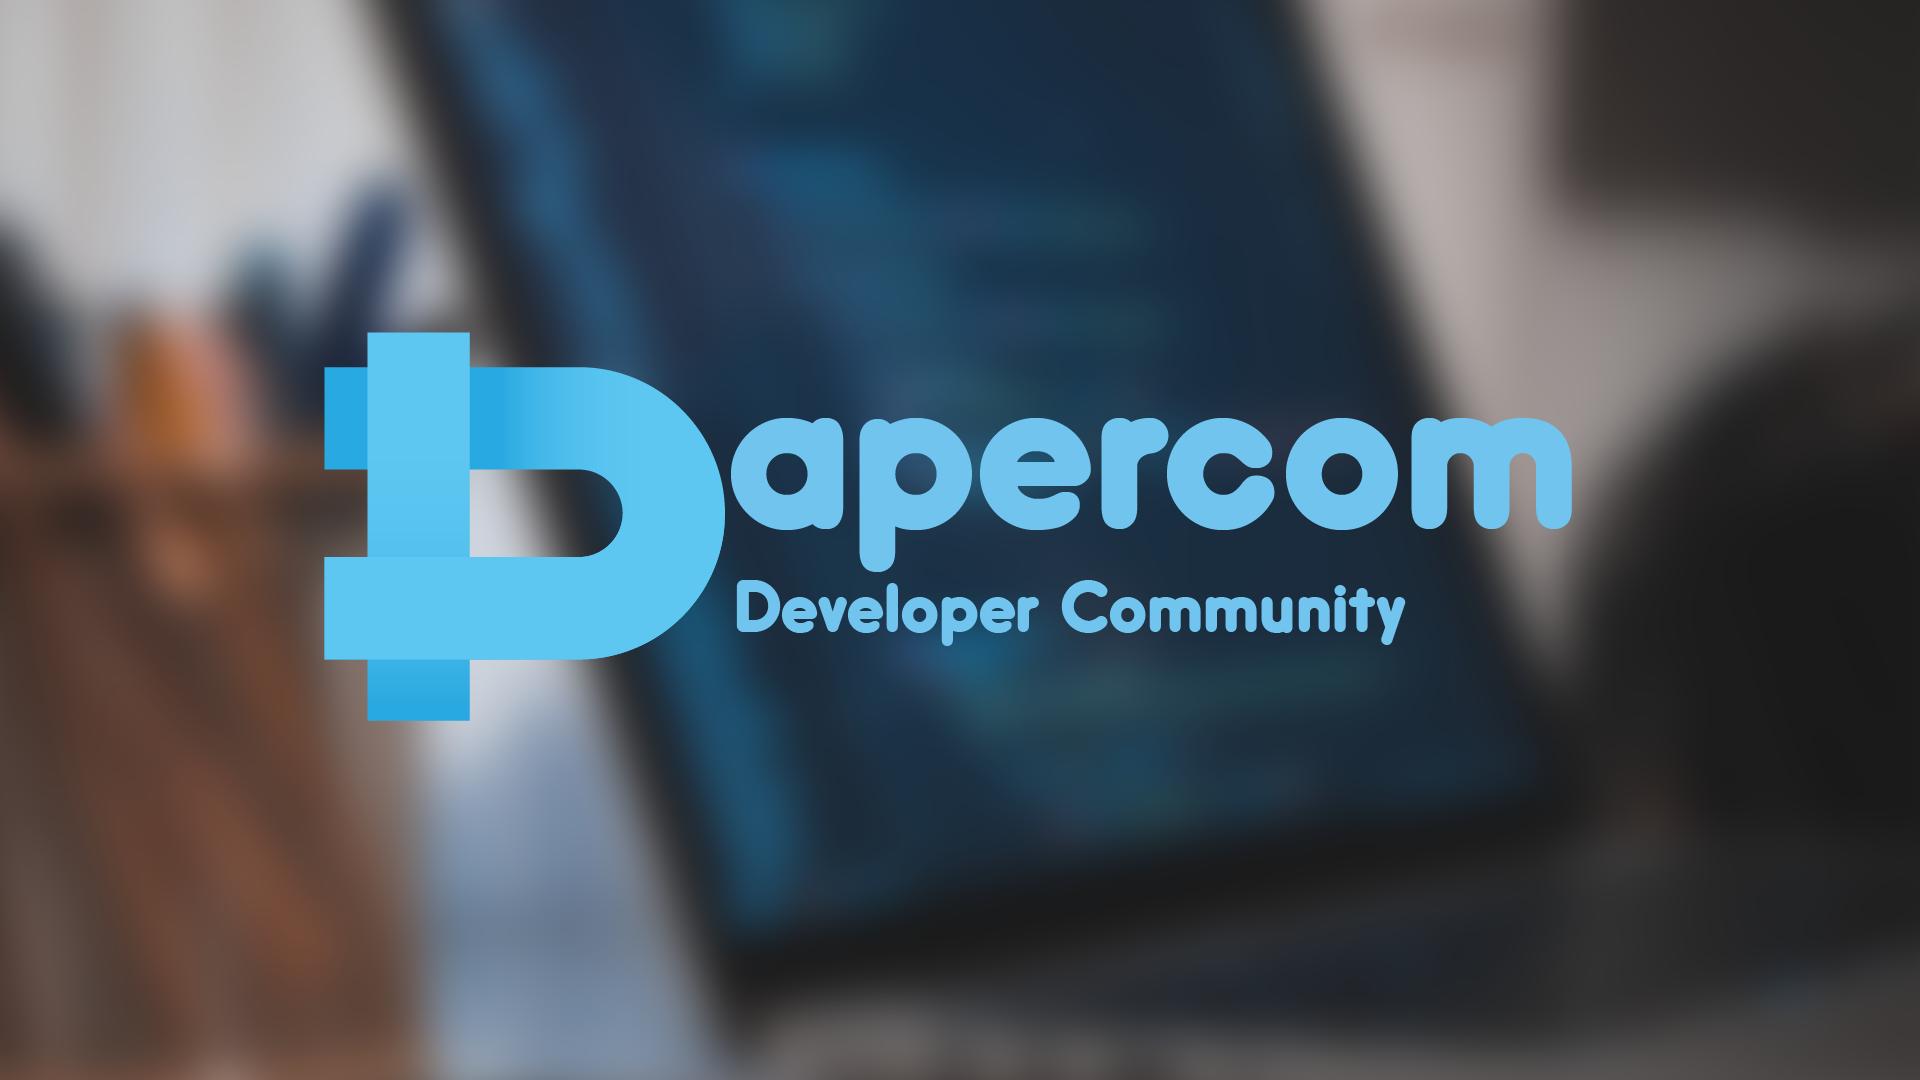 Papercom Pati #Class  4 - Buat Android Layout Pertamamu